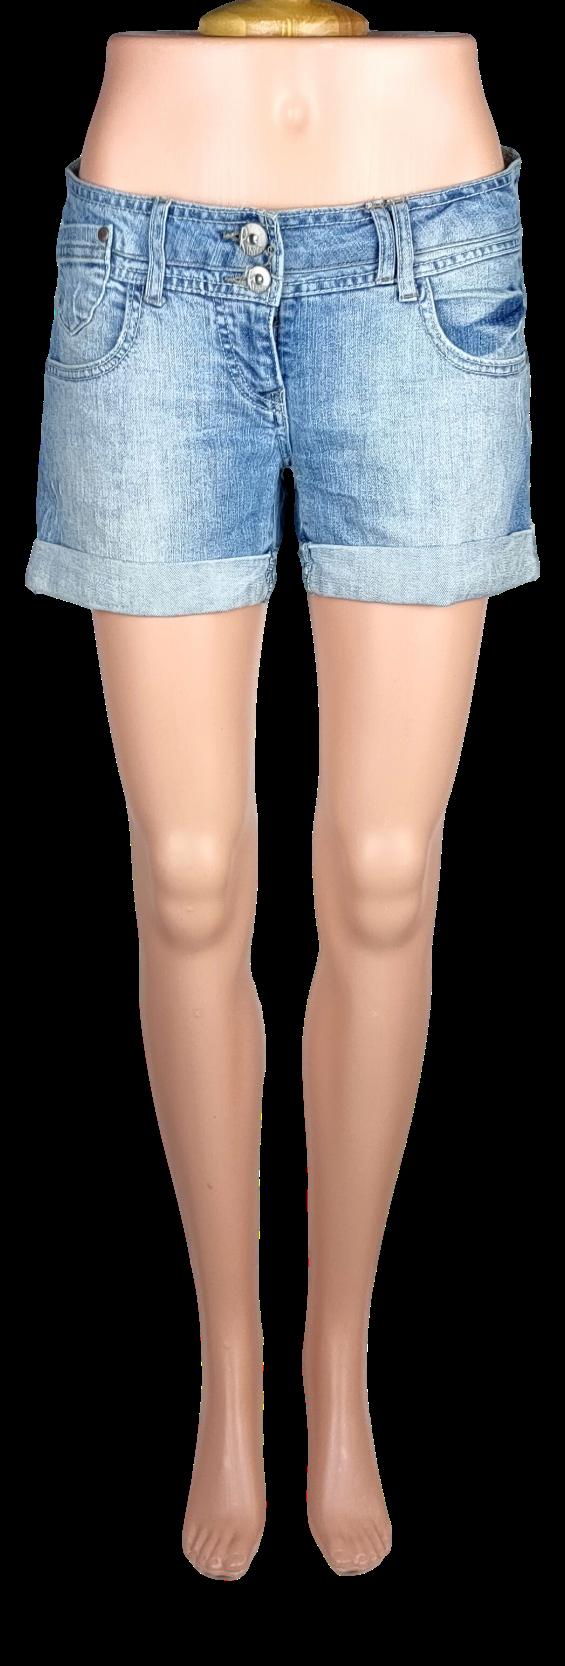 Short Gemo -Taille 38